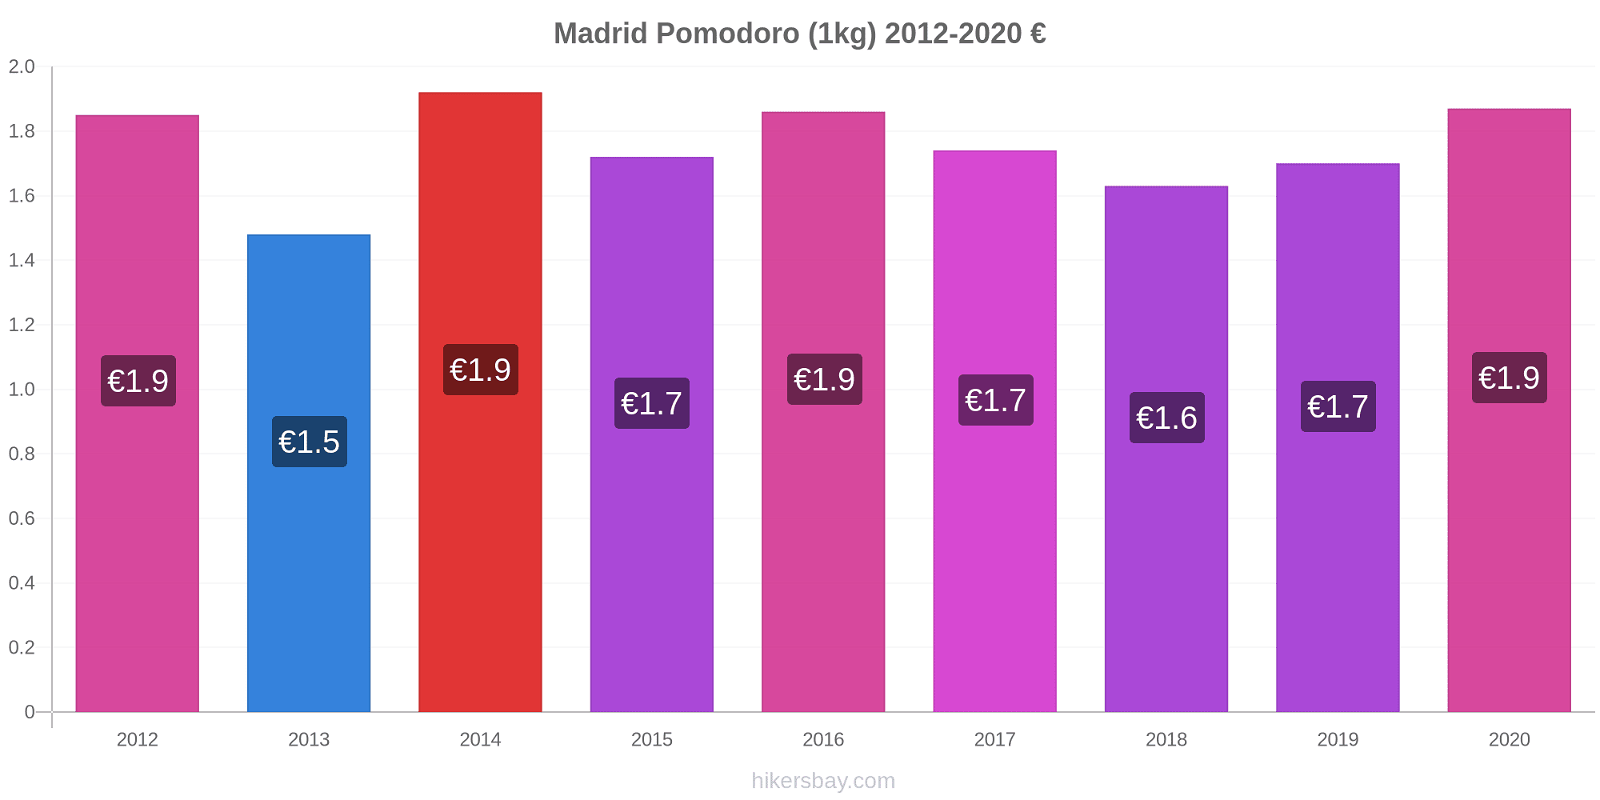 Madrid variazioni di prezzo Pomodoro (1kg) hikersbay.com